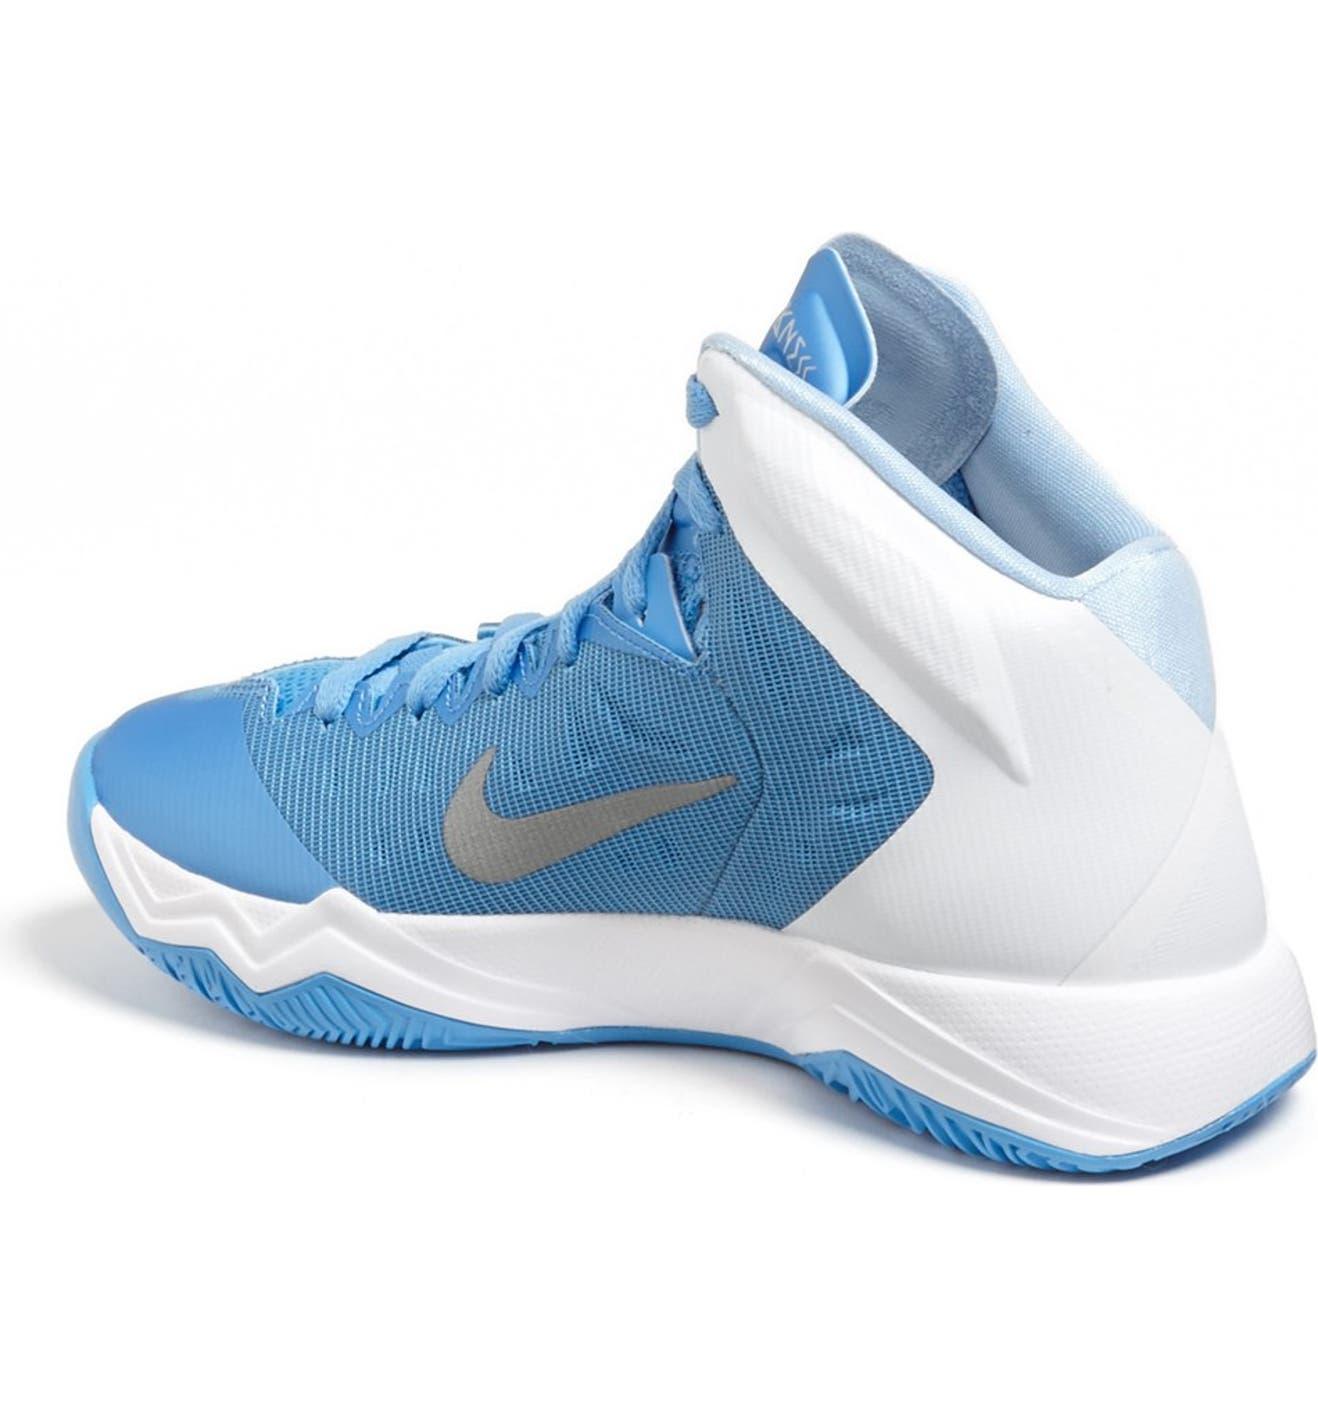 promo code c81a3 fe686 Nike  Hyper Quickness TB  Basketball Shoe (Women)   Nordstrom